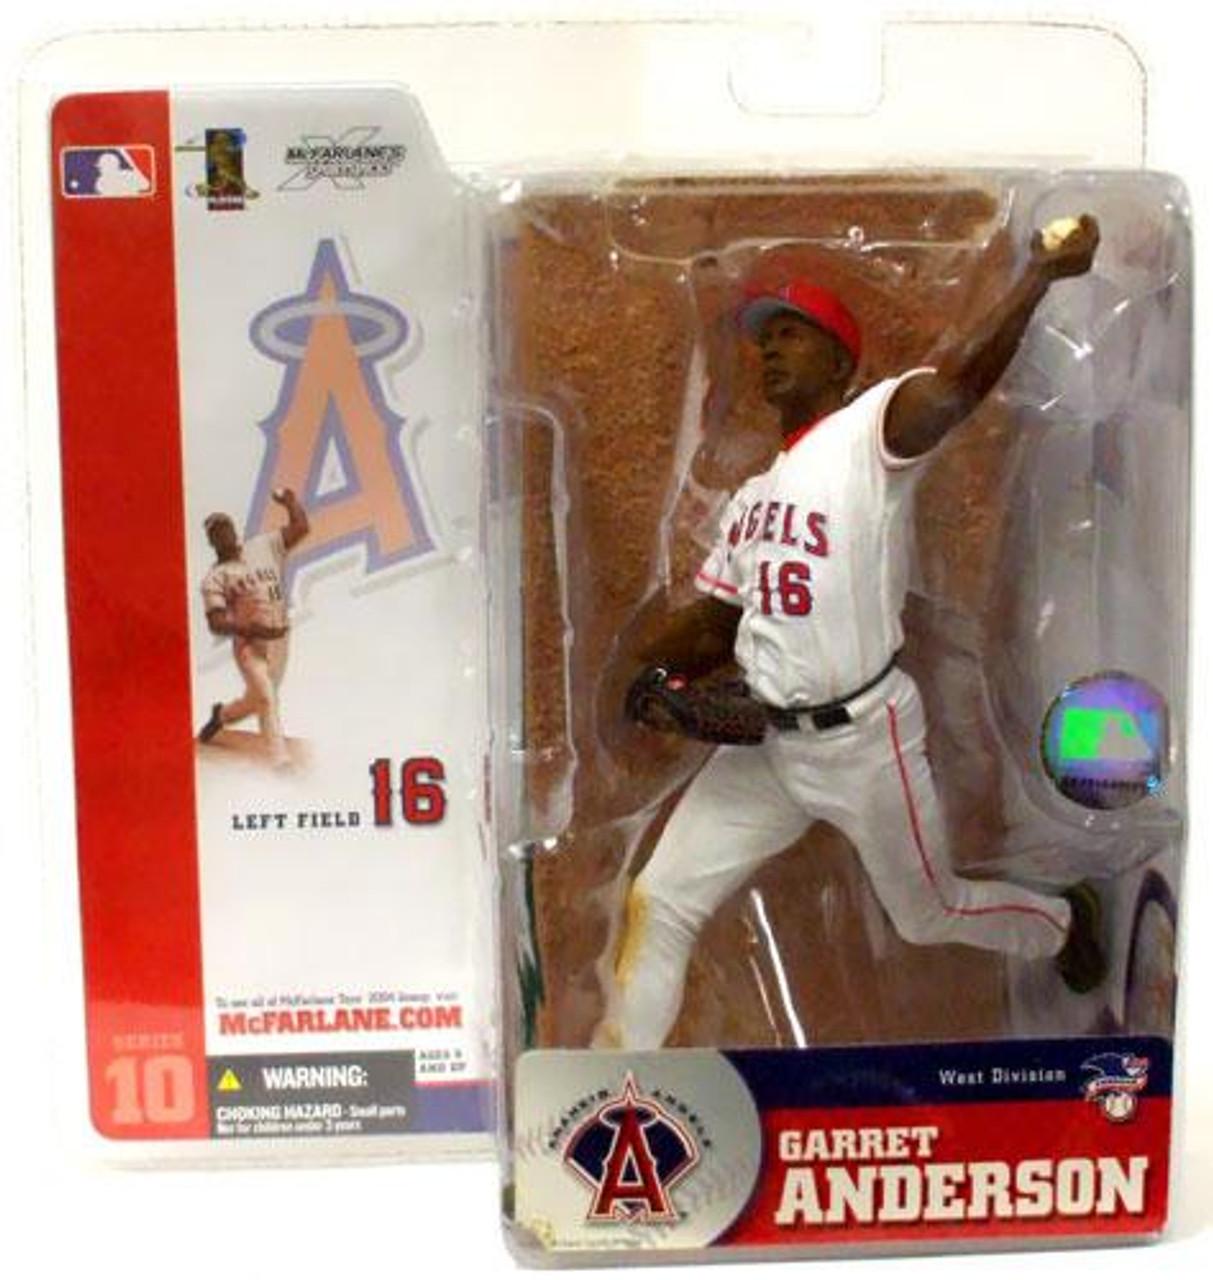 McFarlane Toys MLB Anaheim Angels Sports Picks Series 10 Garret Anderson Action Figure [White Jersey Variant]